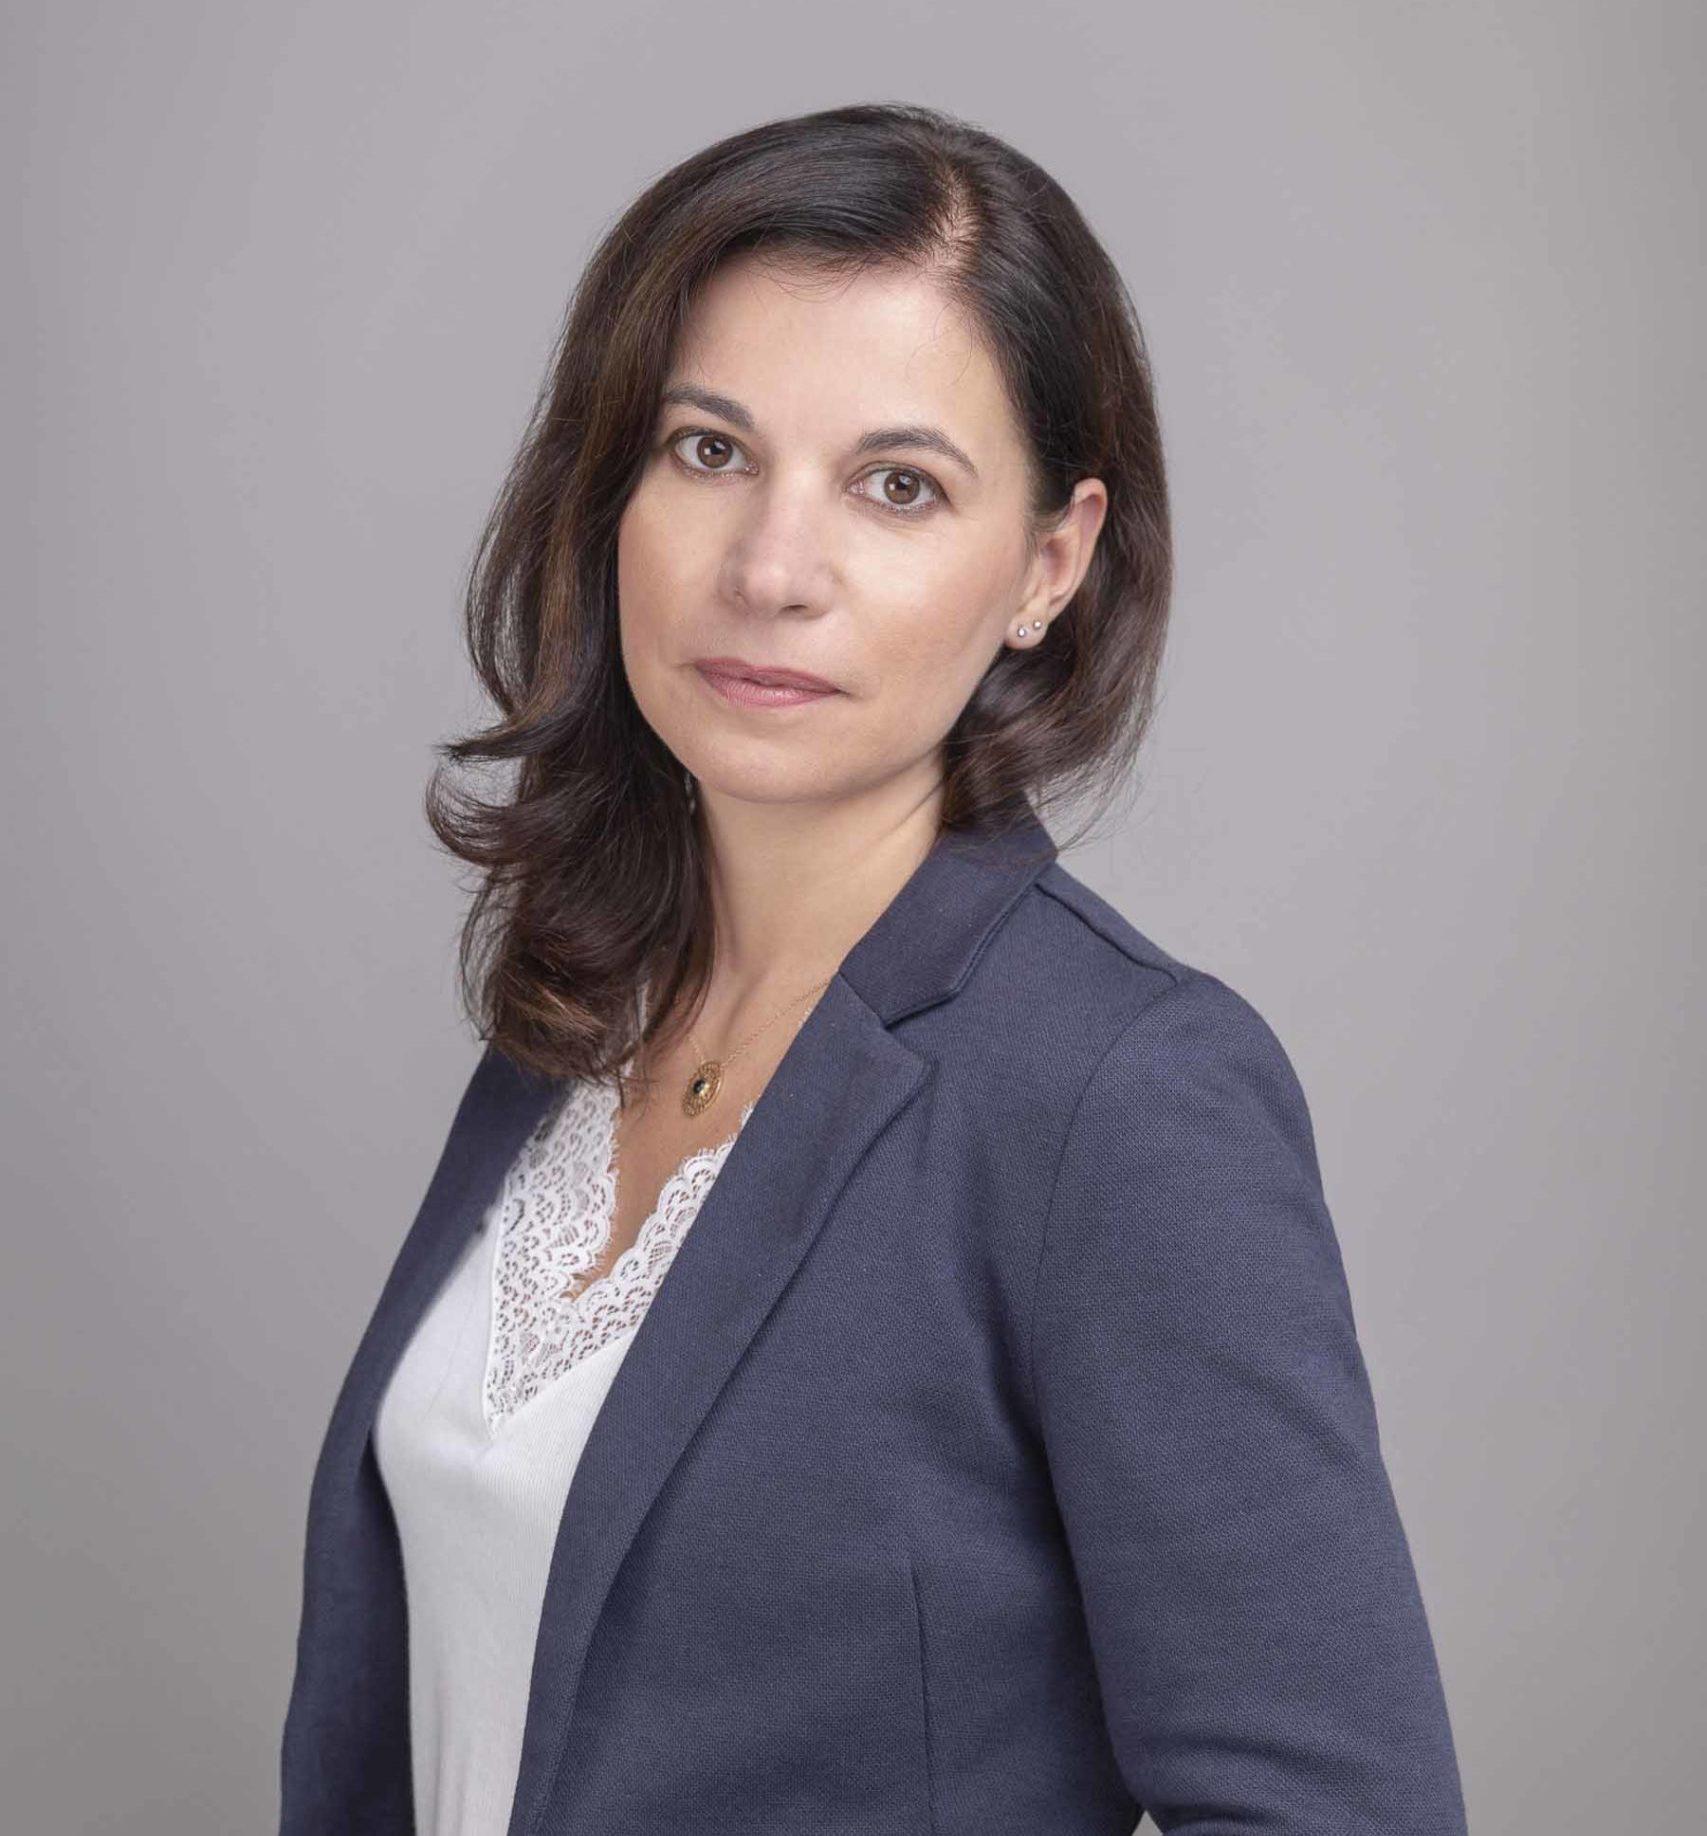 Sylvia Valin